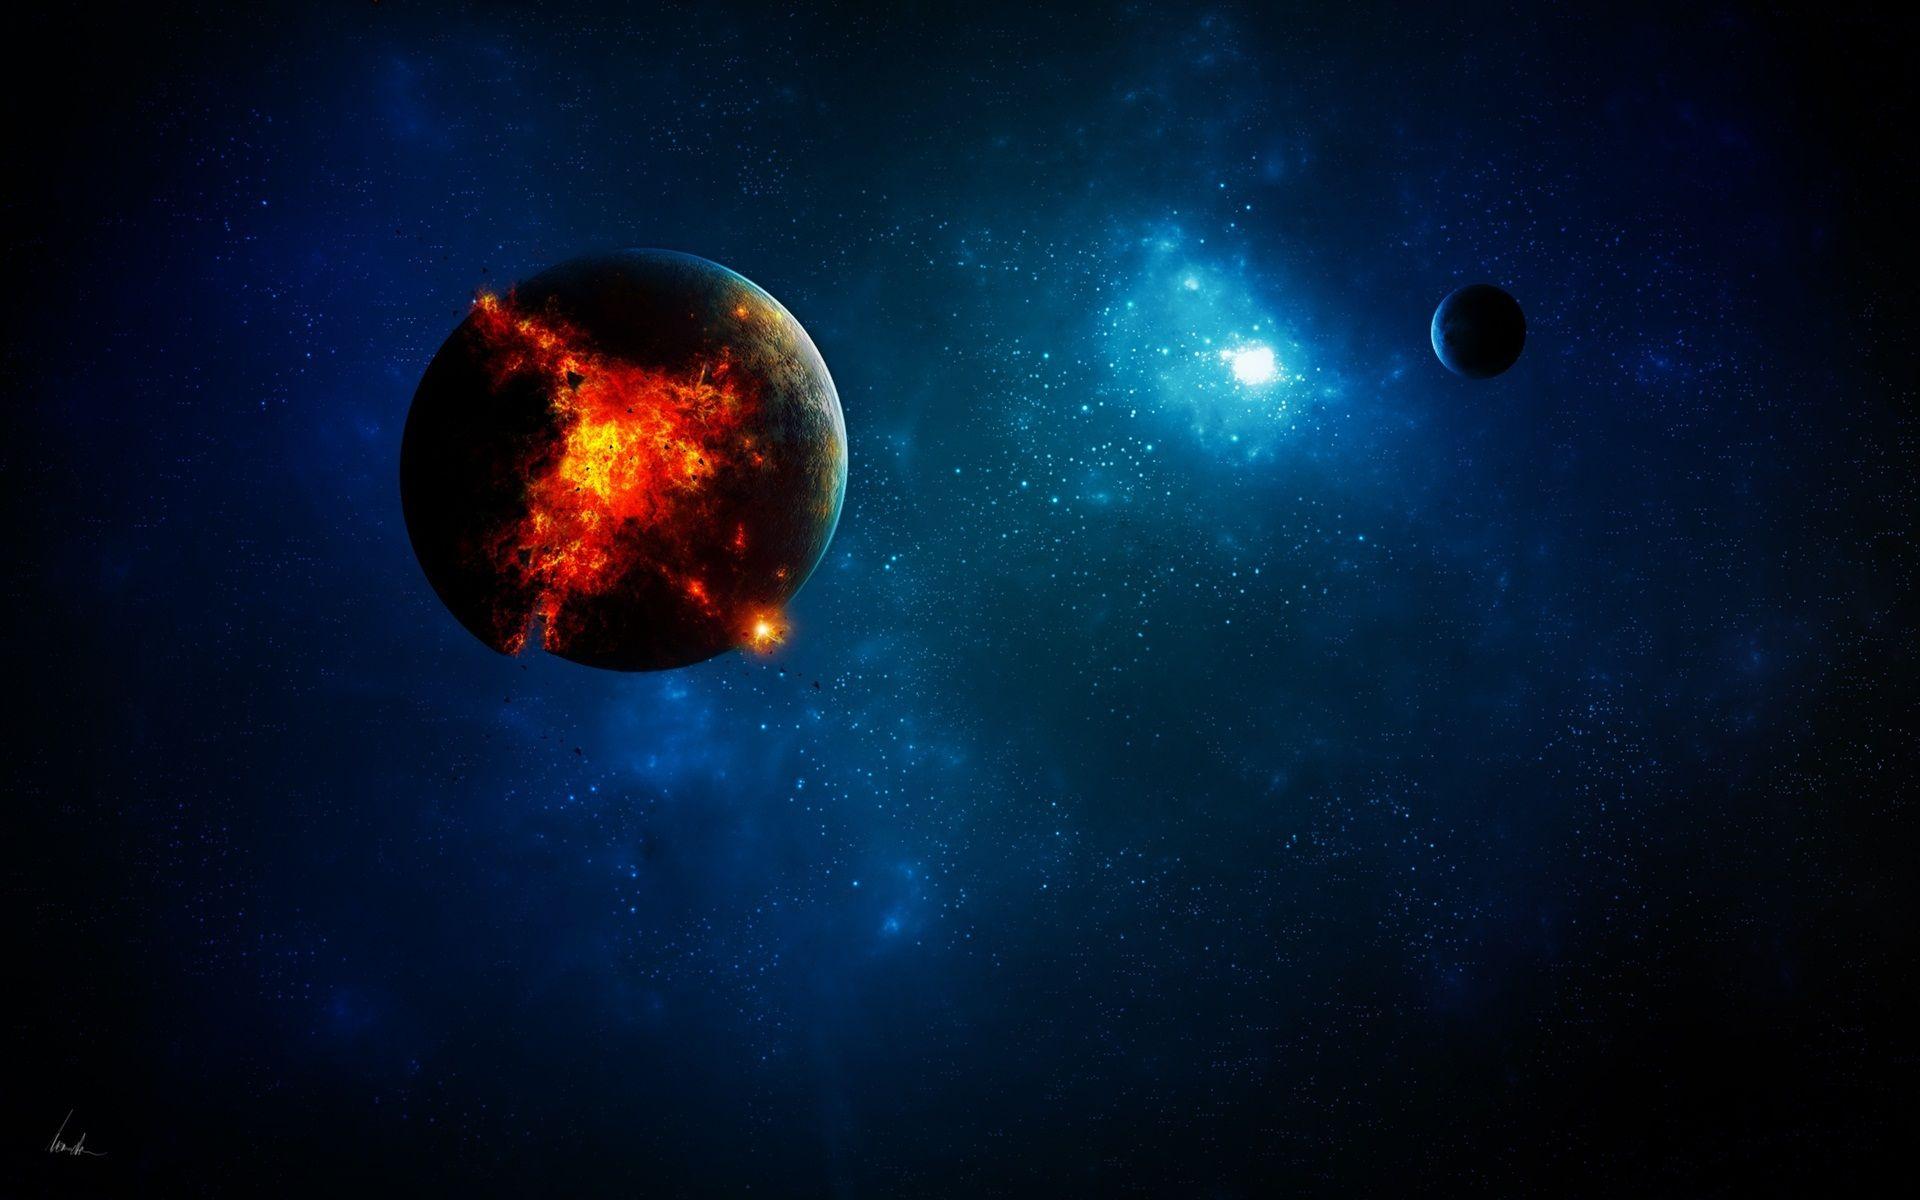 Light Planets Apocalypse Space Earth Destruction